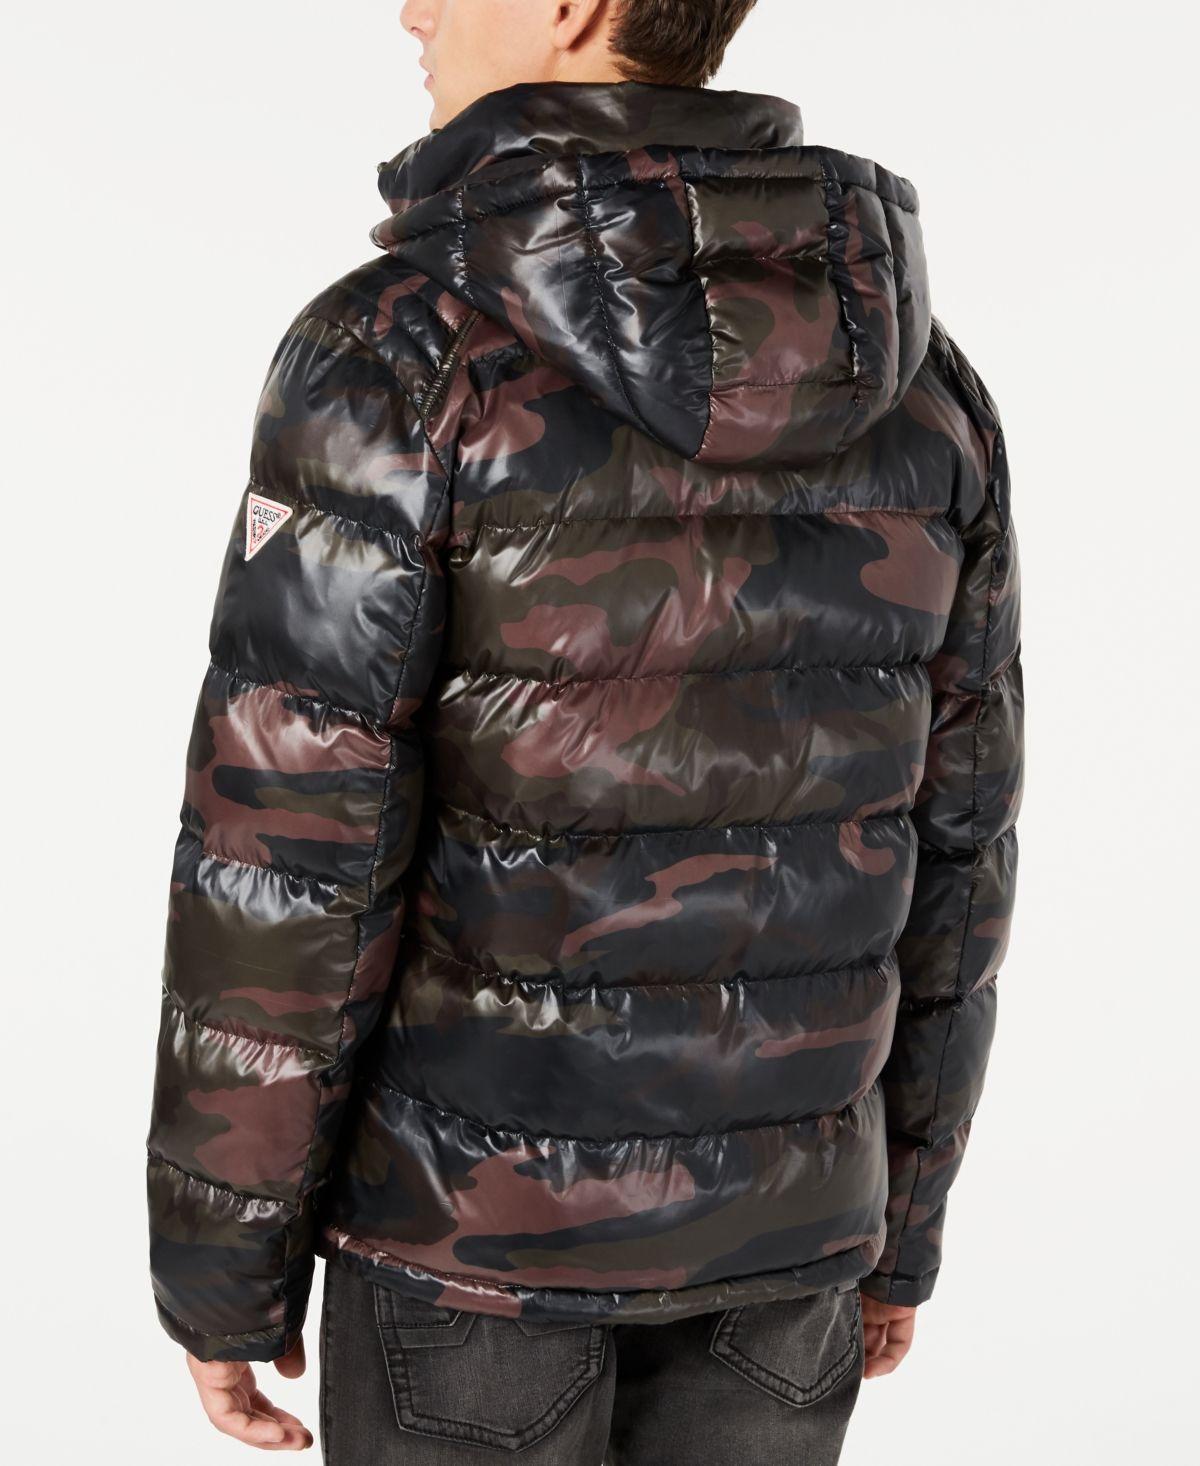 Guess Men S Hooded Puffer Coat Reviews Coats Jackets Men Macy S Guess Men Trendy Mens Fashion Mens Hooded [ 1466 x 1200 Pixel ]